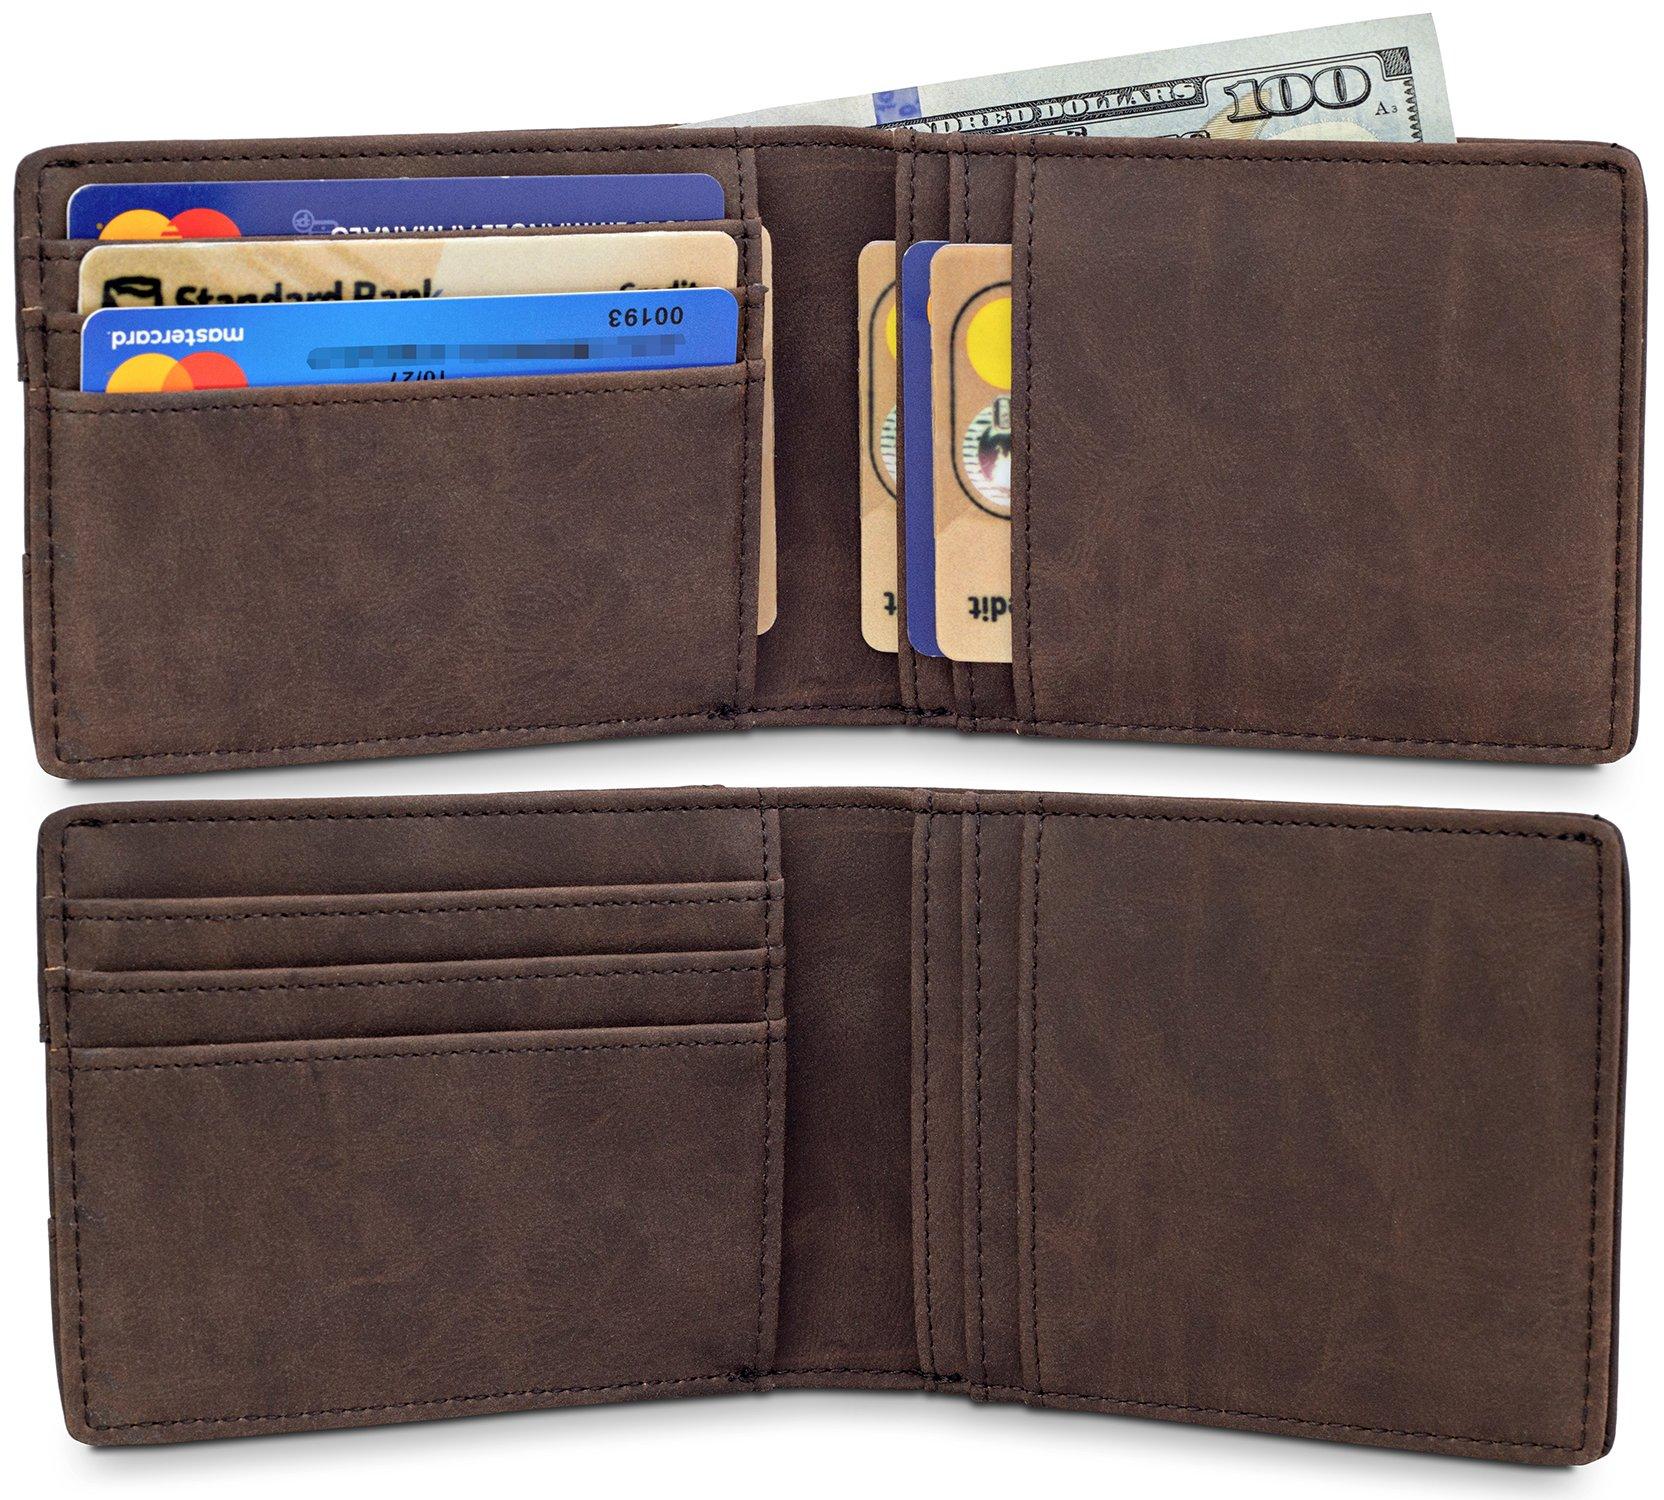 TRAVANDO Slim Wallets BUFFALO - RFID Blocking Wallet - 8 Card Pockets - Mini Credit Card Holder - Travel Wallet - Minimalist Bifold Wallet for Men with Gift Box by Travando (Image #4)